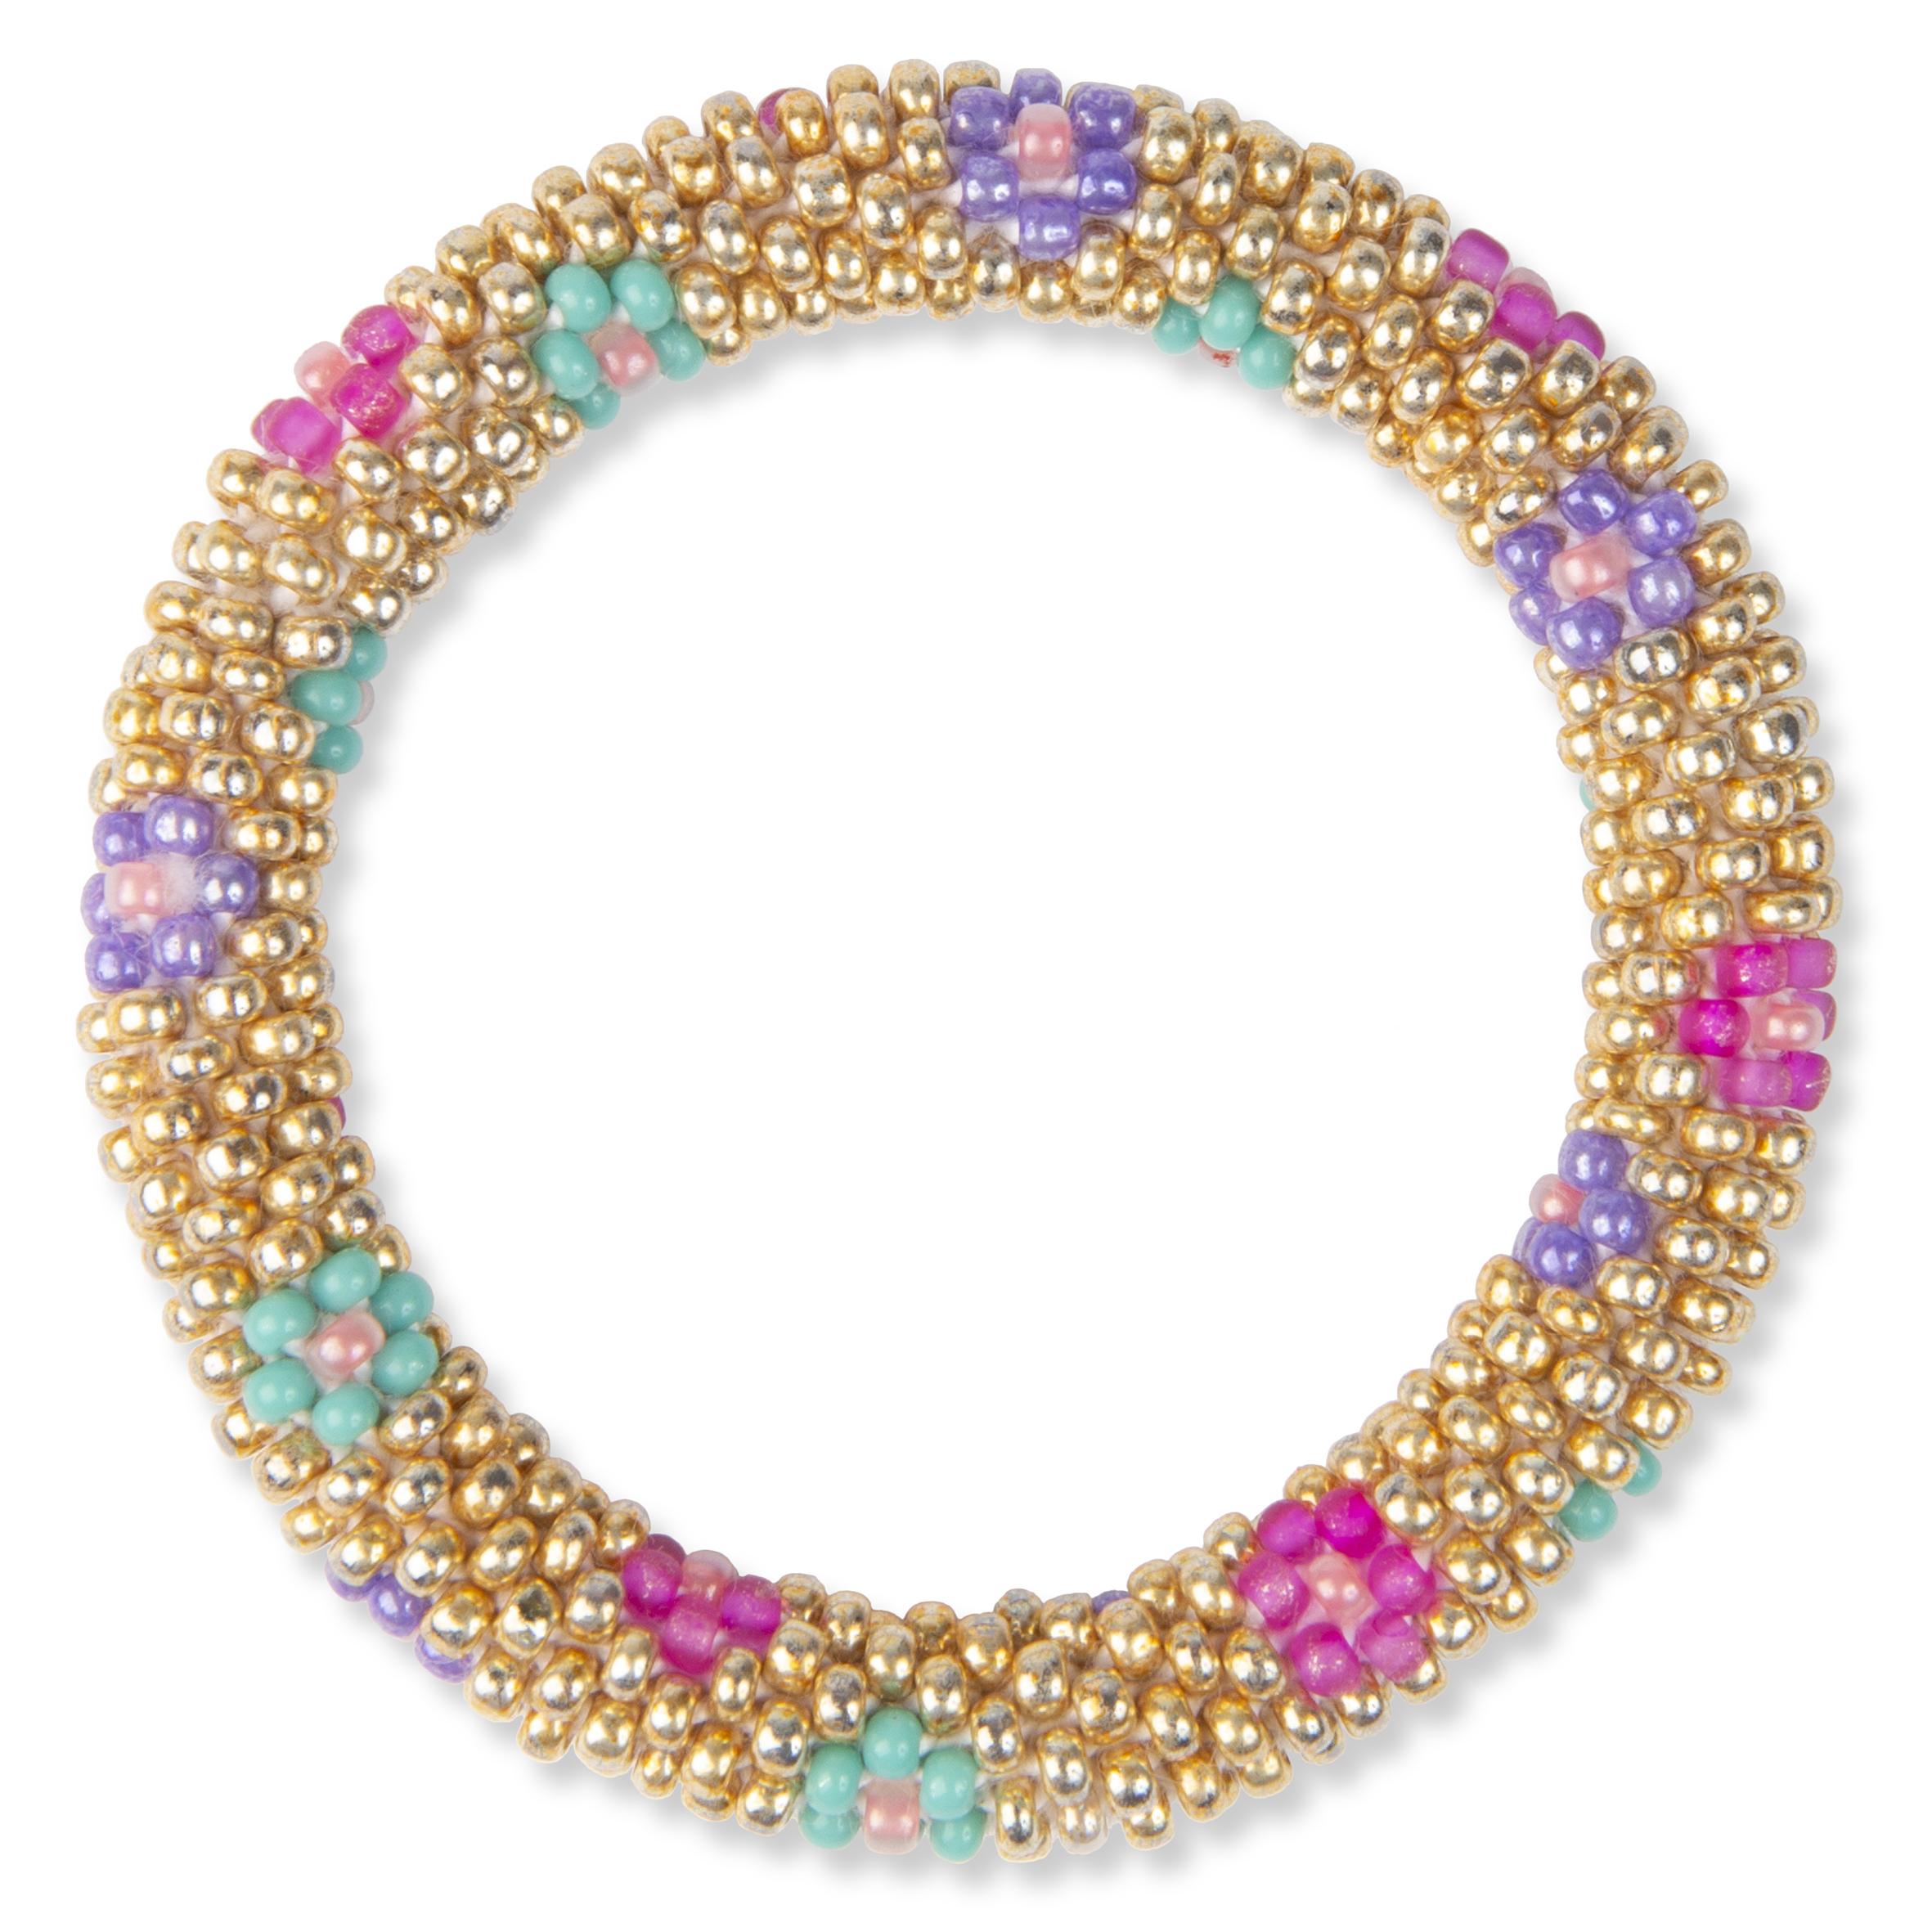 Barnsmycke pfg Stockholm Pearls Kids-Crochet Bracelet 11005-07